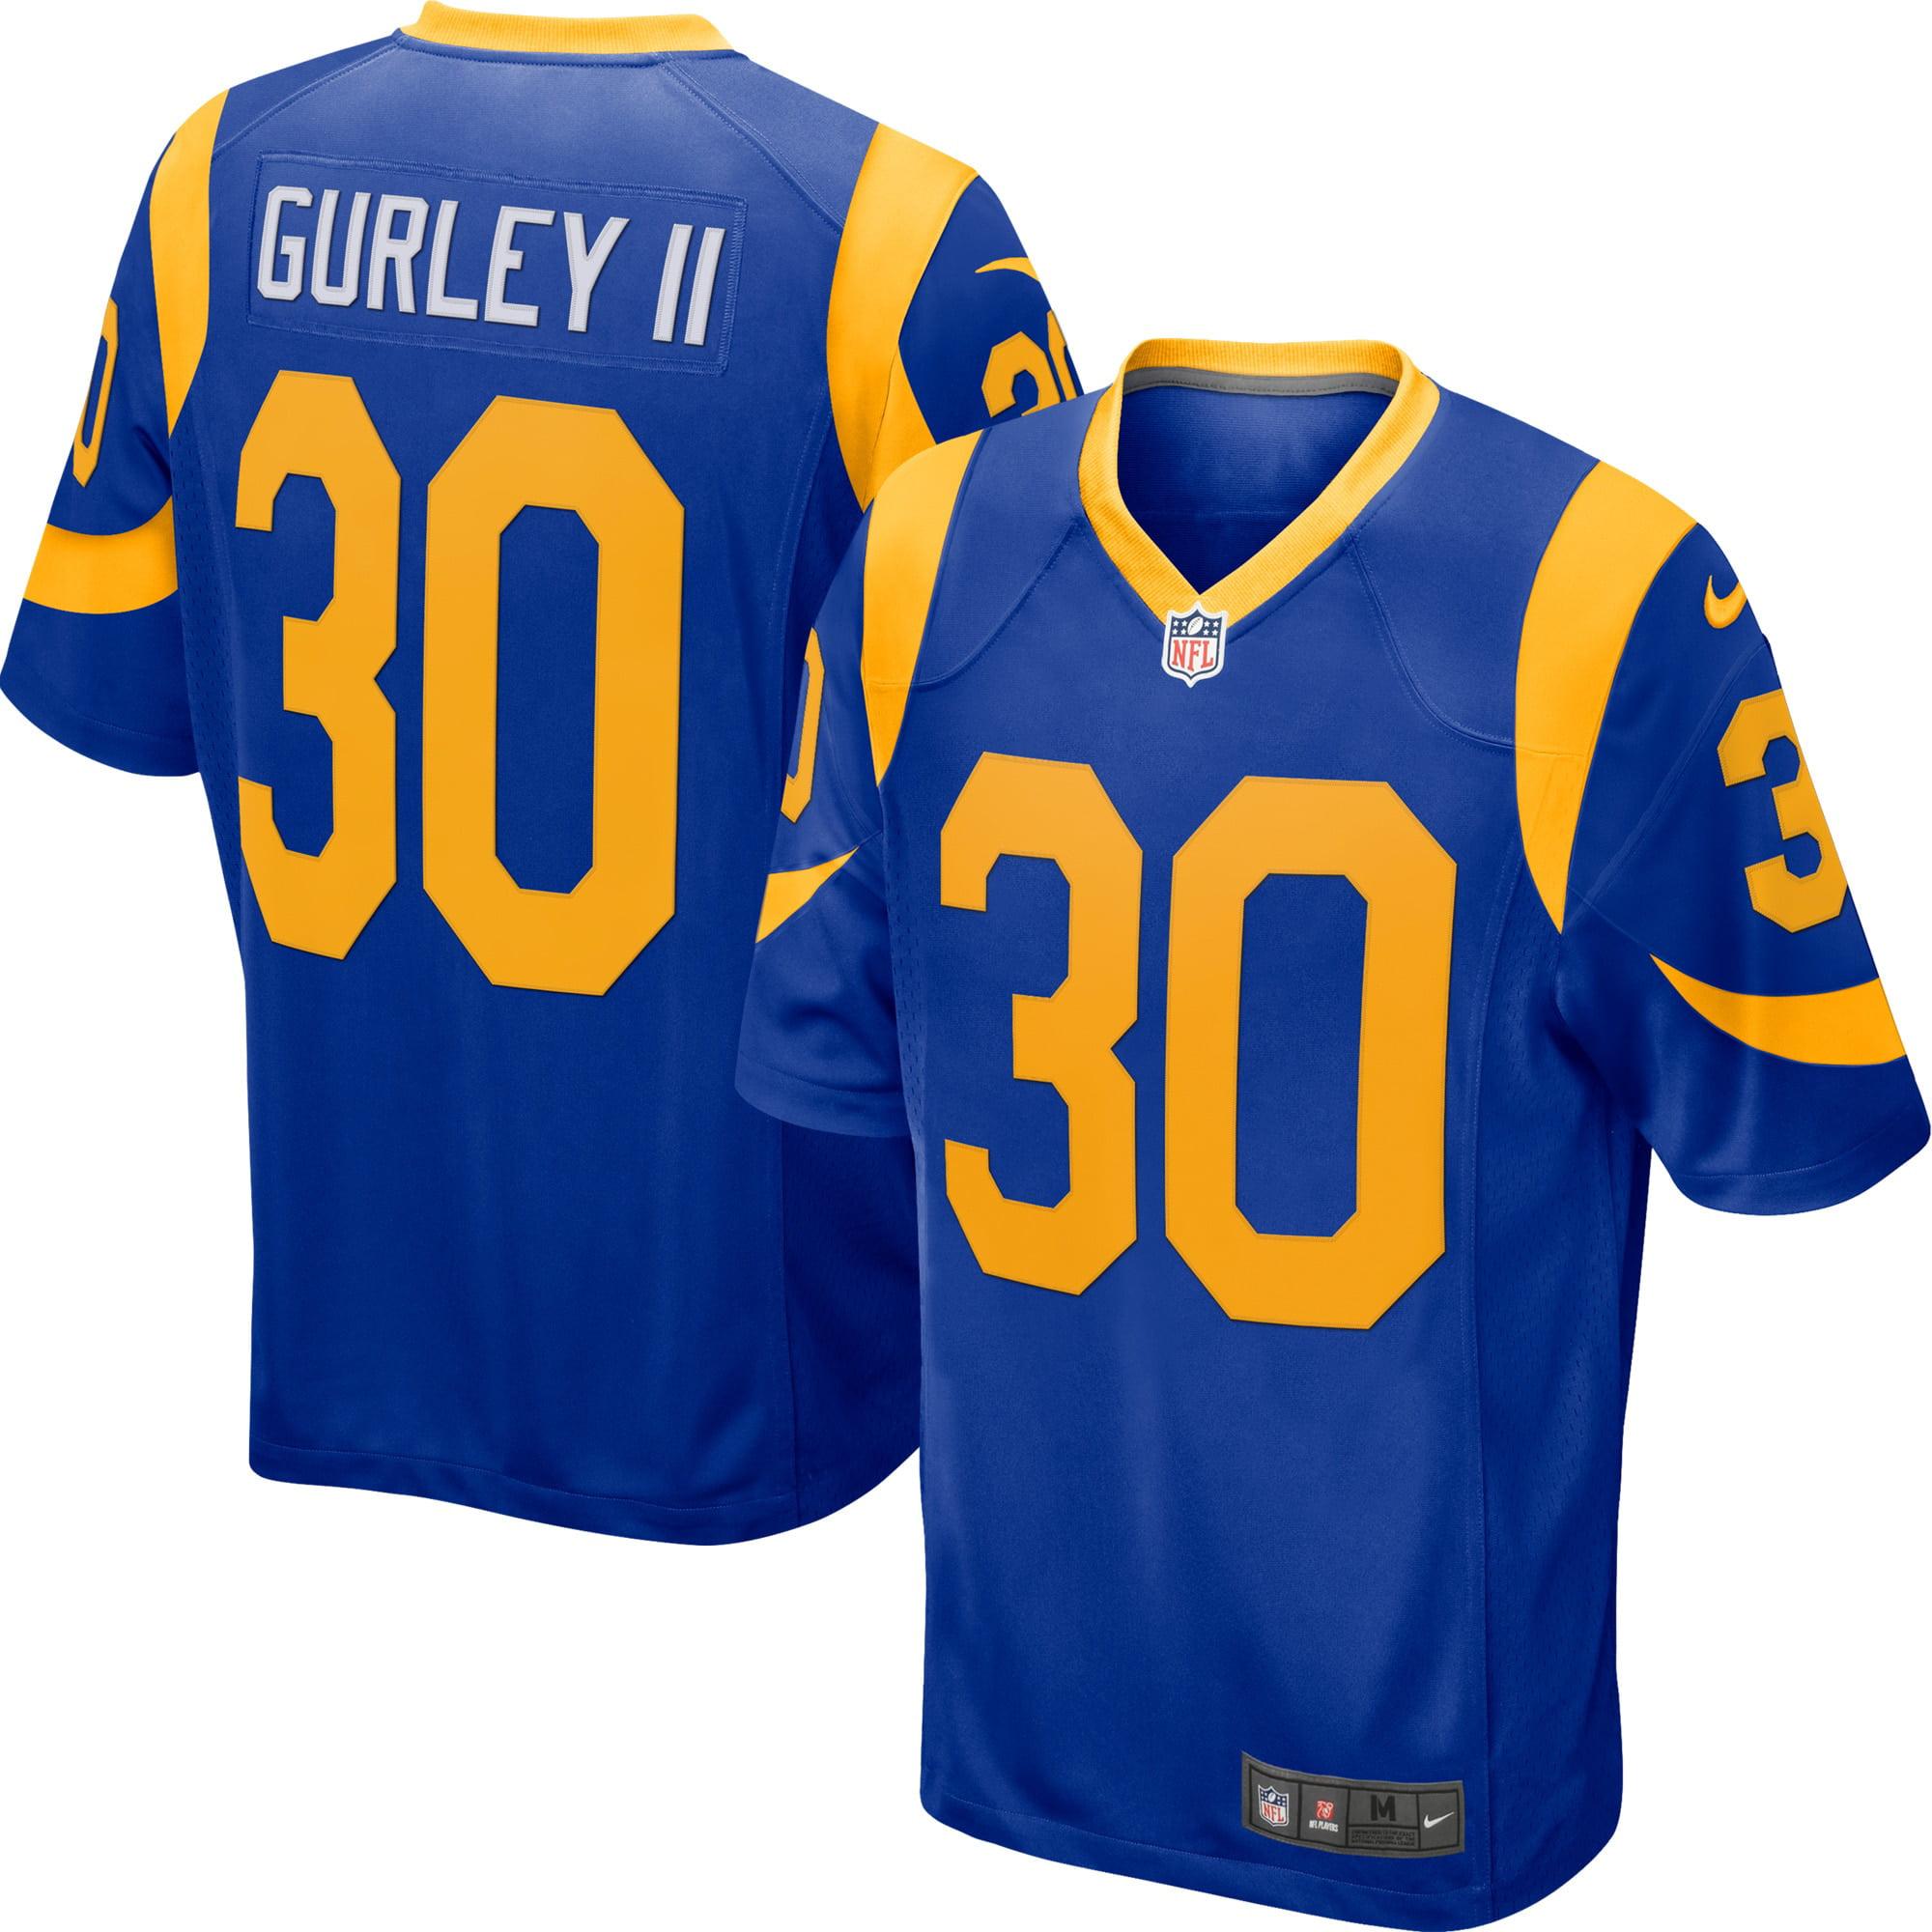 Todd Gurley II Los Angeles Rams Nike Player Game Jersey - Royal - Walmart.com